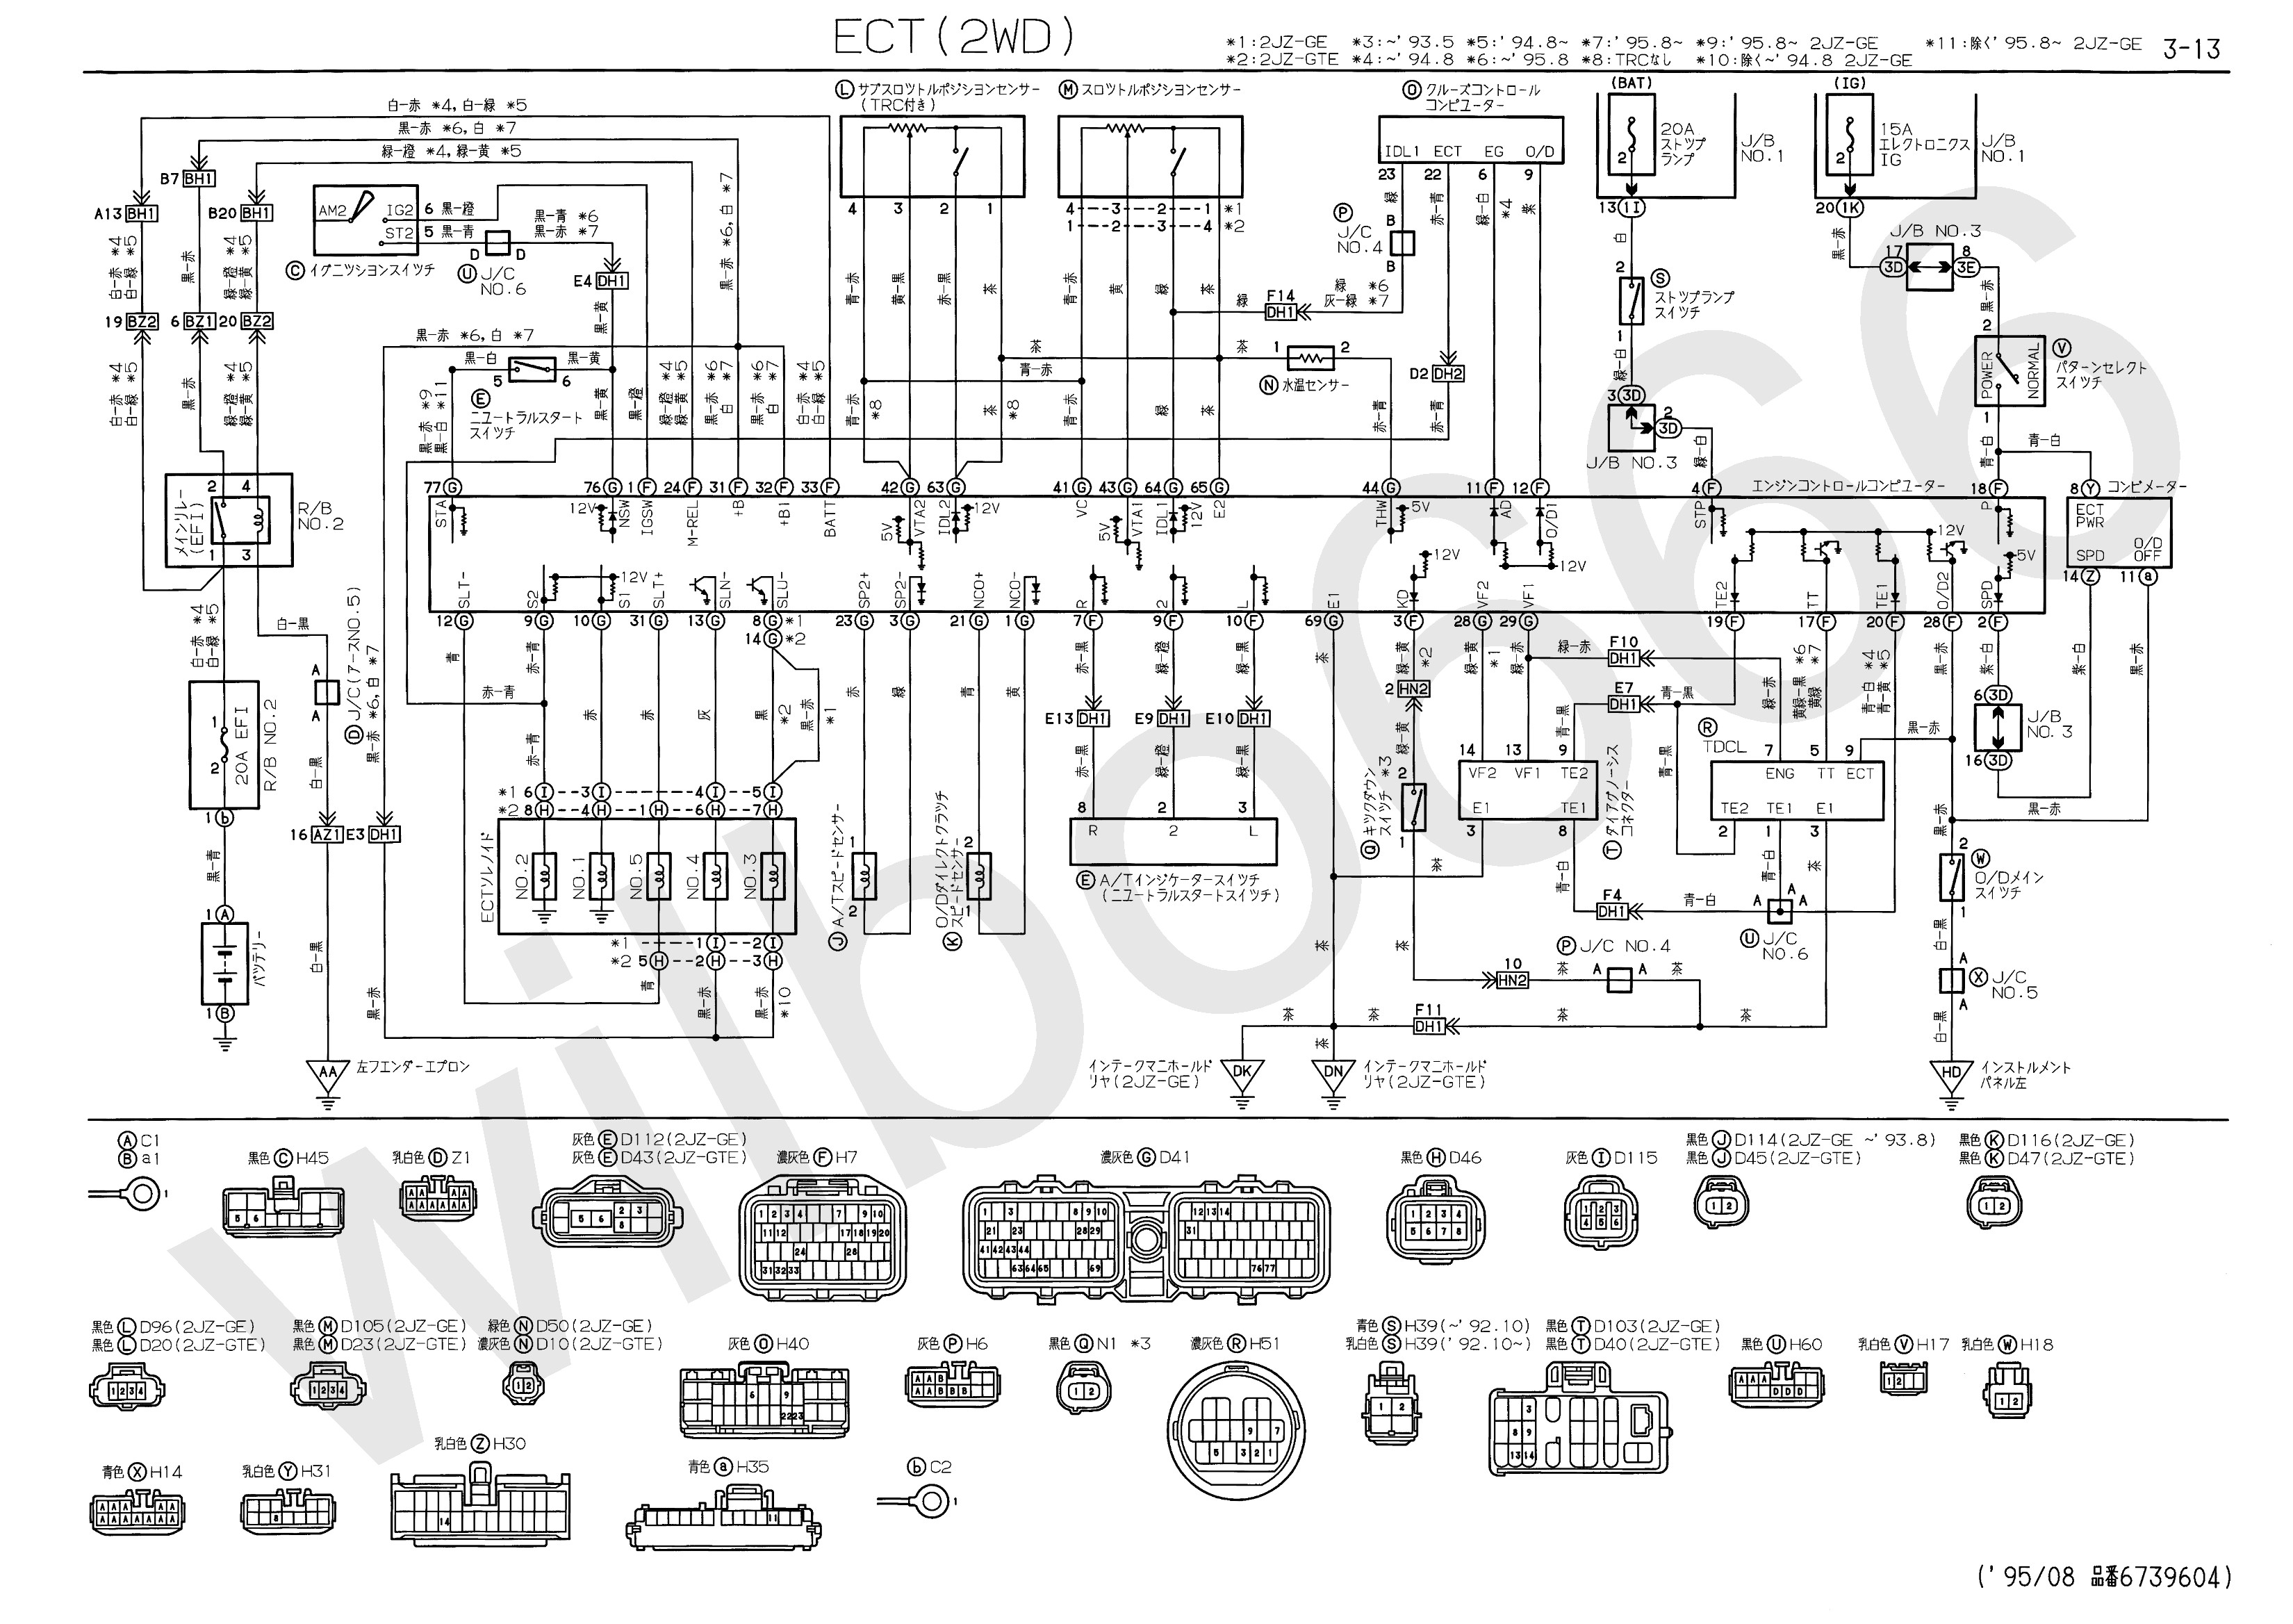 Car Engine Block Diagram on 2002 Mazda Millenia S Used Engine